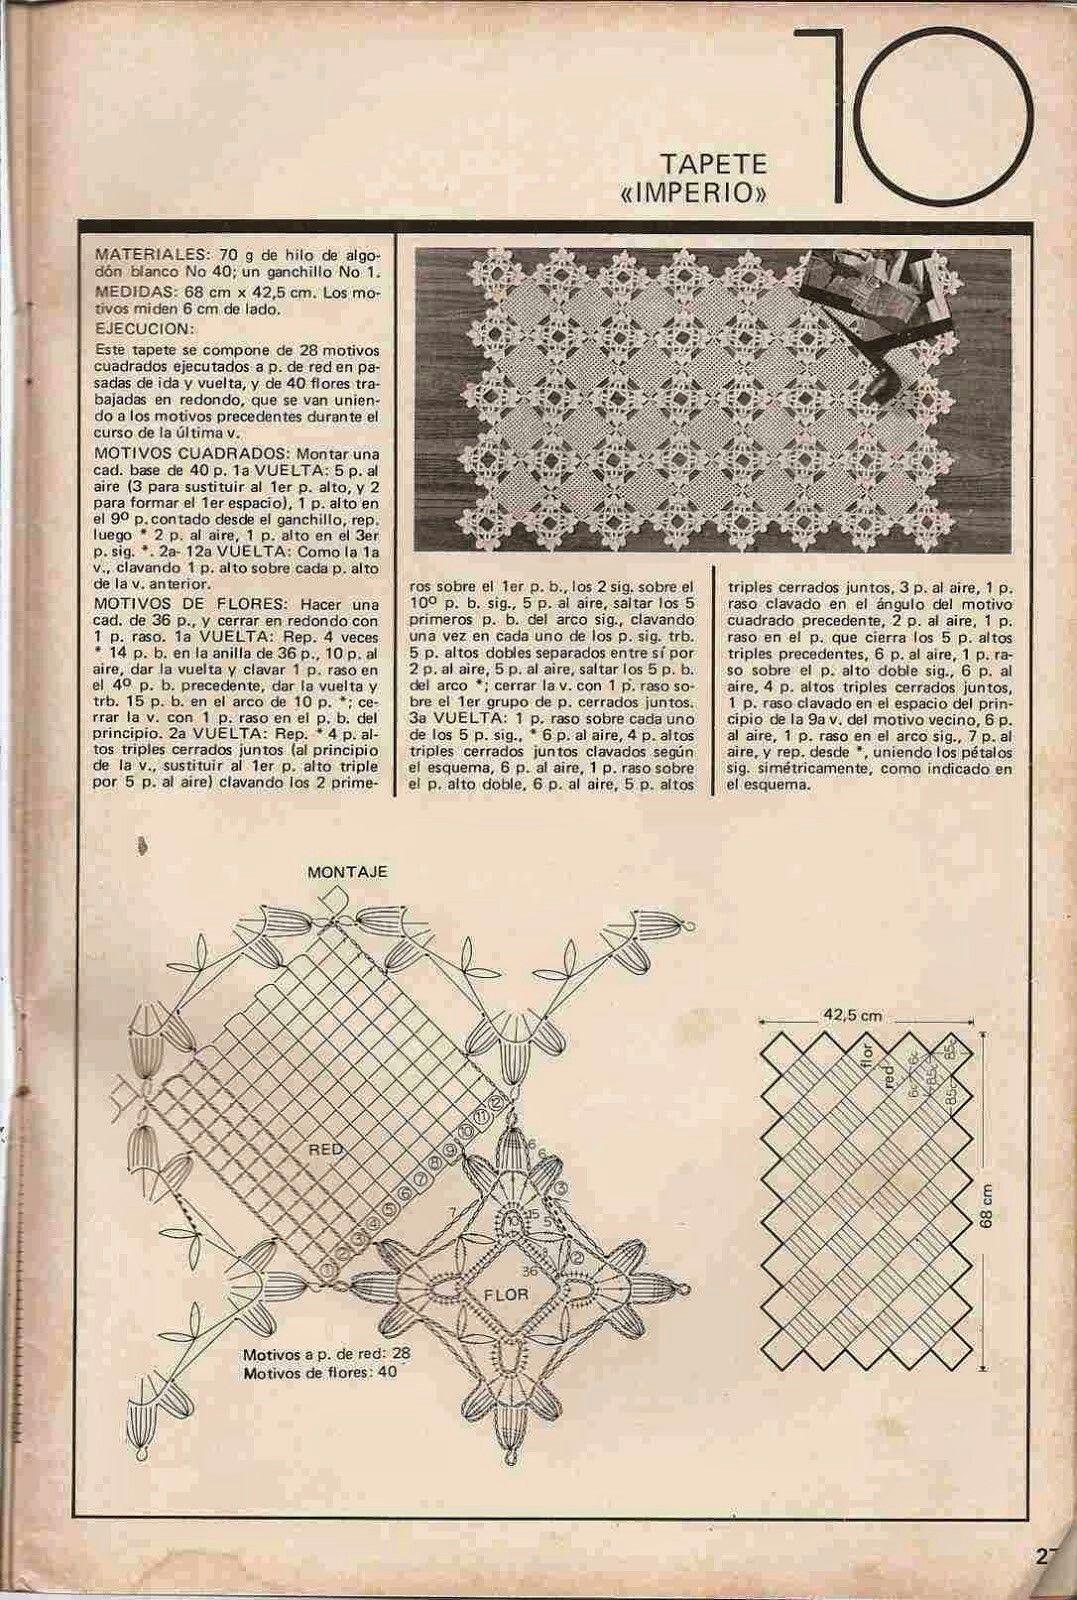 Pin de kristiina viibur en Crochet motifs | Pinterest | Cuadrados ...